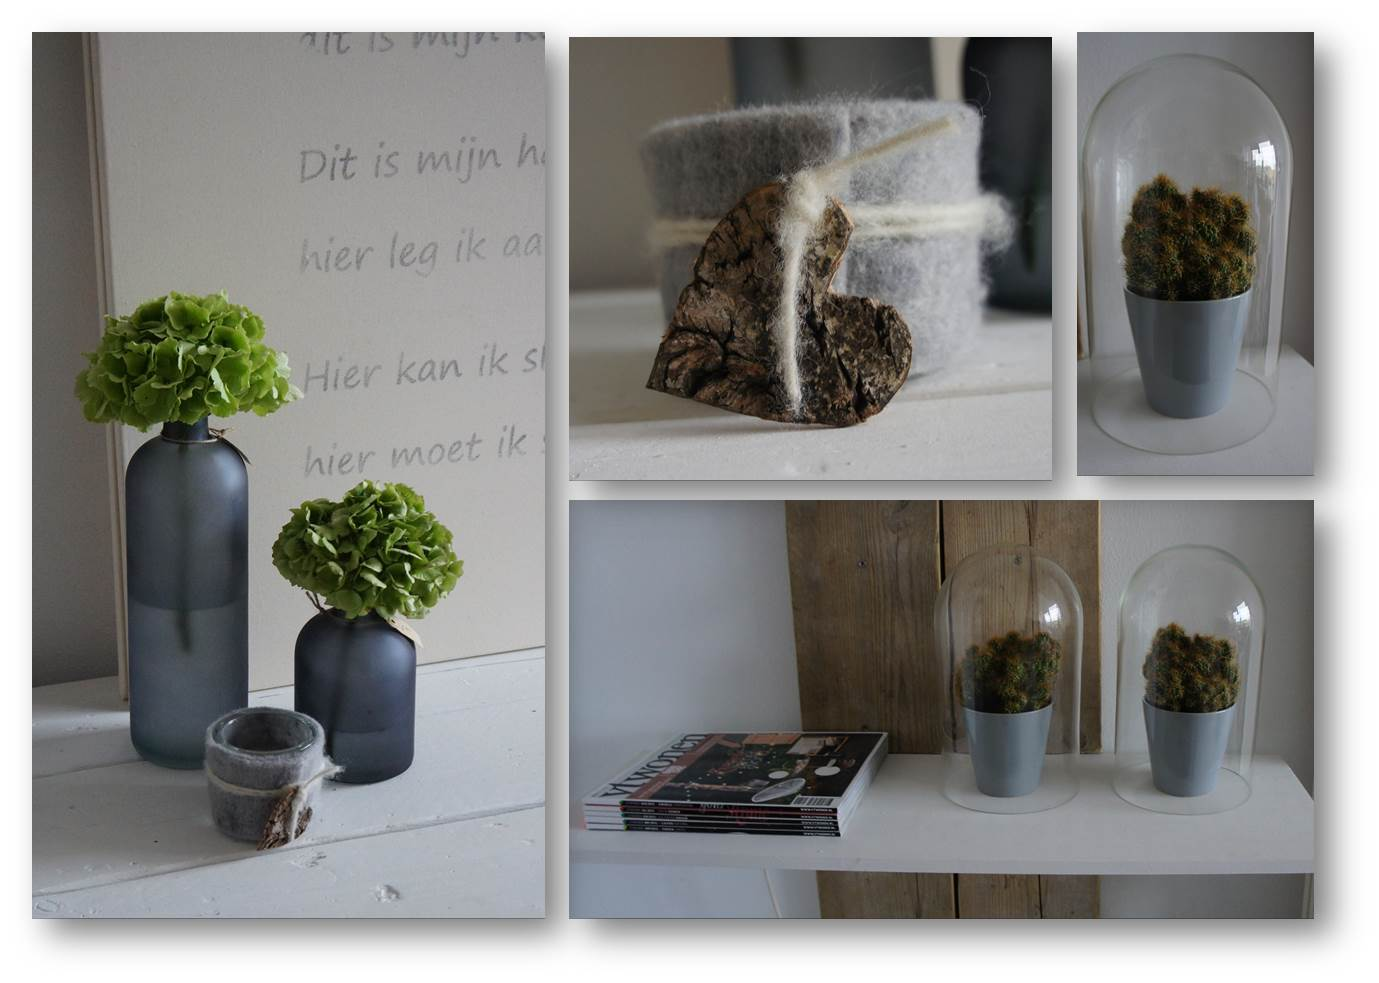 Kast woonkamer decoratie 100 images hous woonkamer tilburg woonkamer woon en zo meubelzaak - Decoratie idee ...